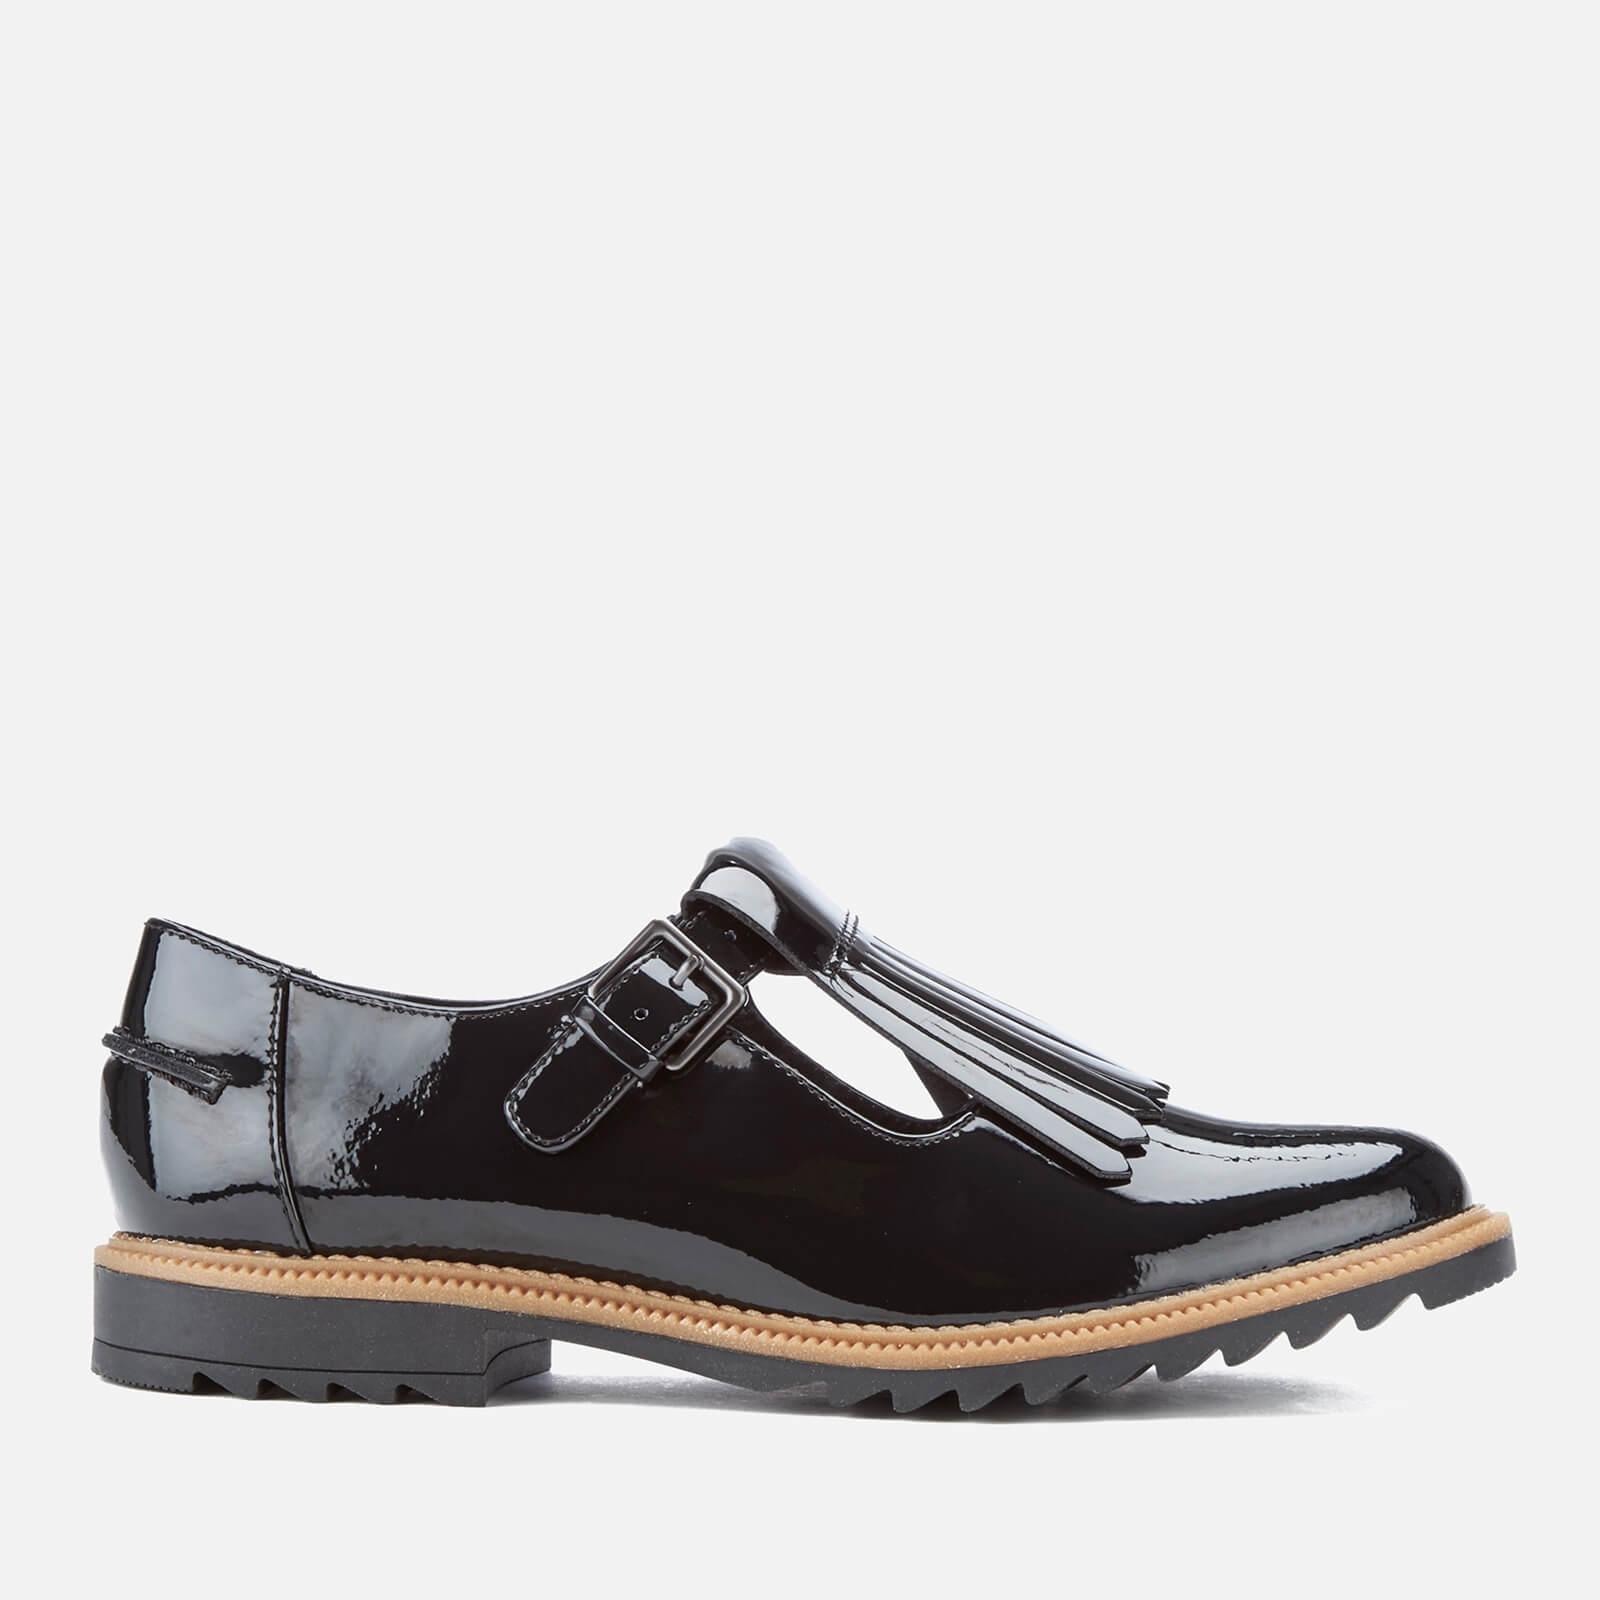 Clarks Women's Griffin Mia Patent Frill T Bar Shoes - Black - UK 8 - Black